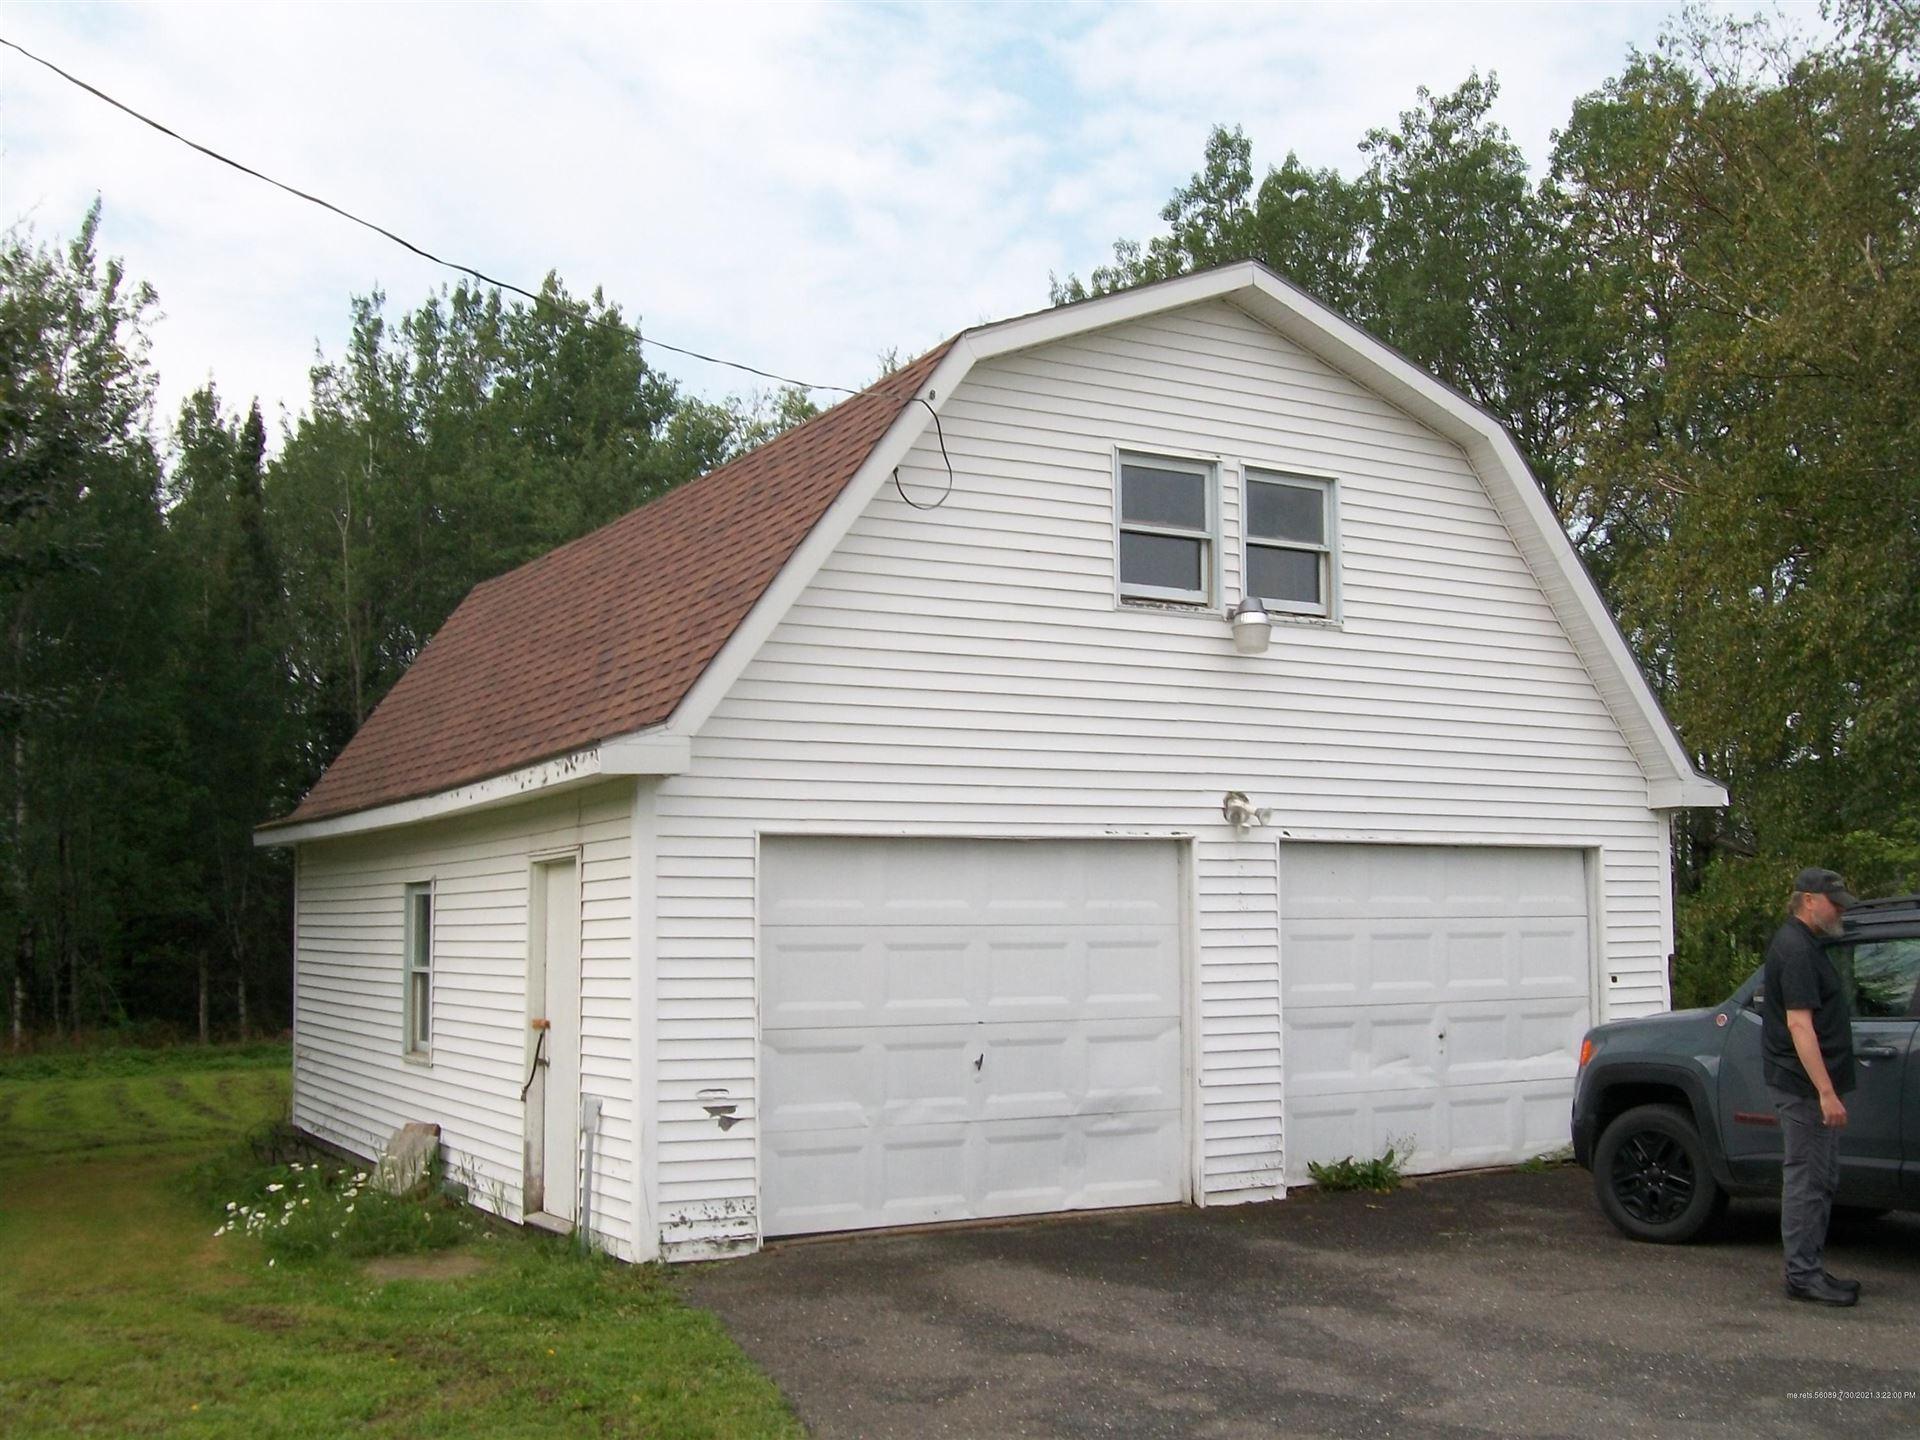 Photo of 1134 Willard Road, Connor Township, ME 04736 (MLS # 1503039)